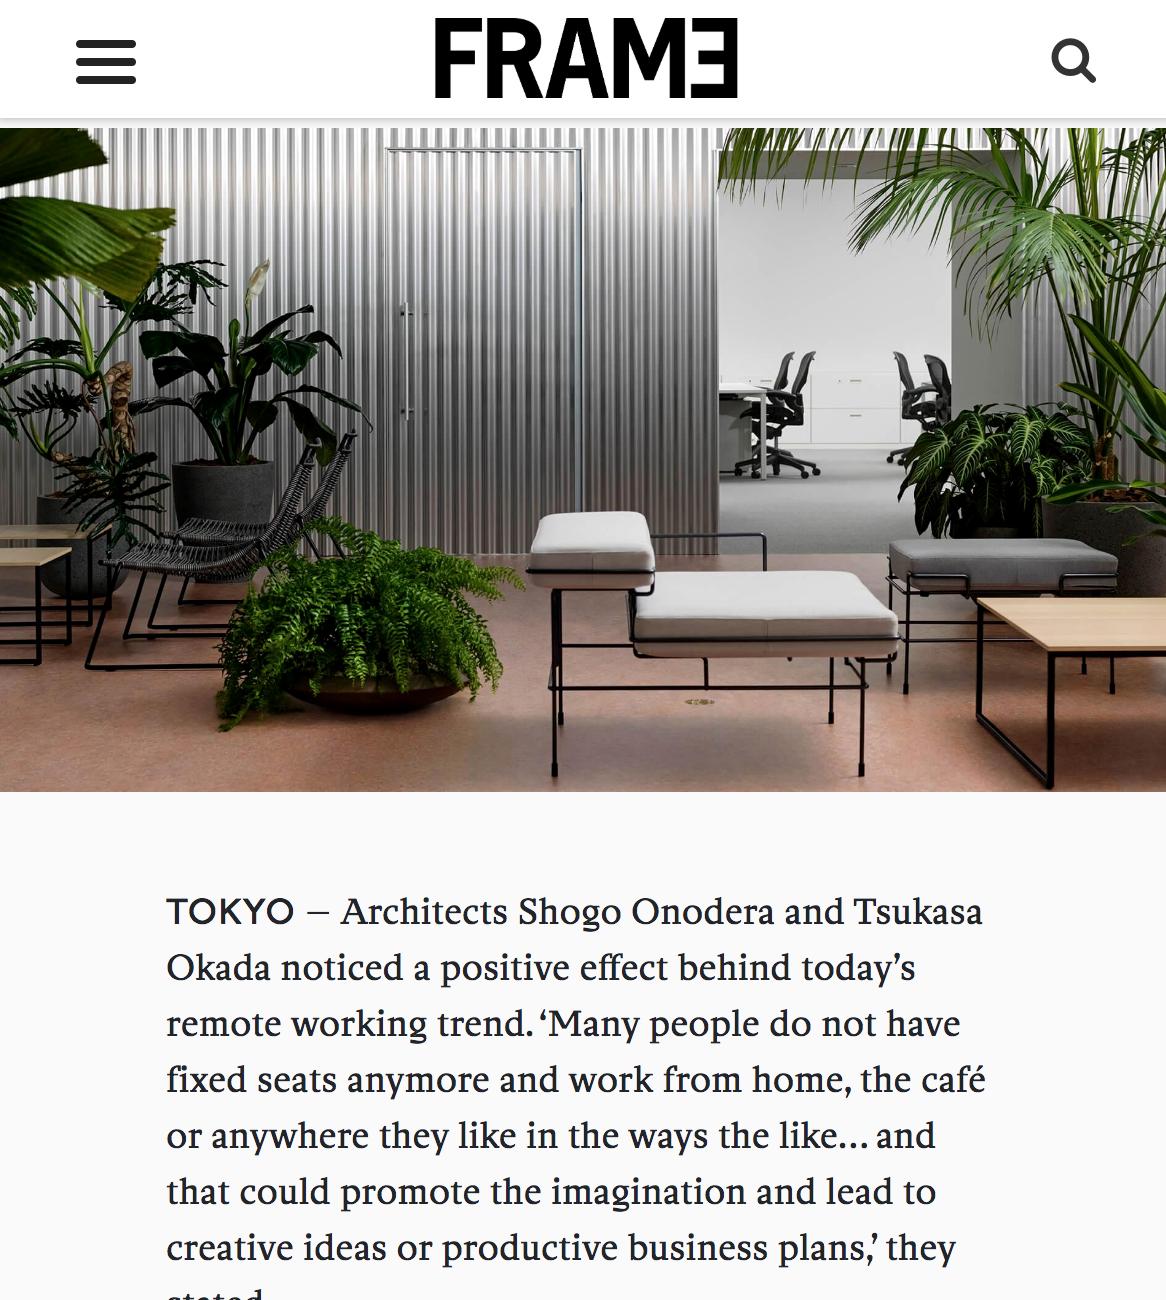 FRAME web 2018年10月 中庭のあるオフィス | Office with a Patio